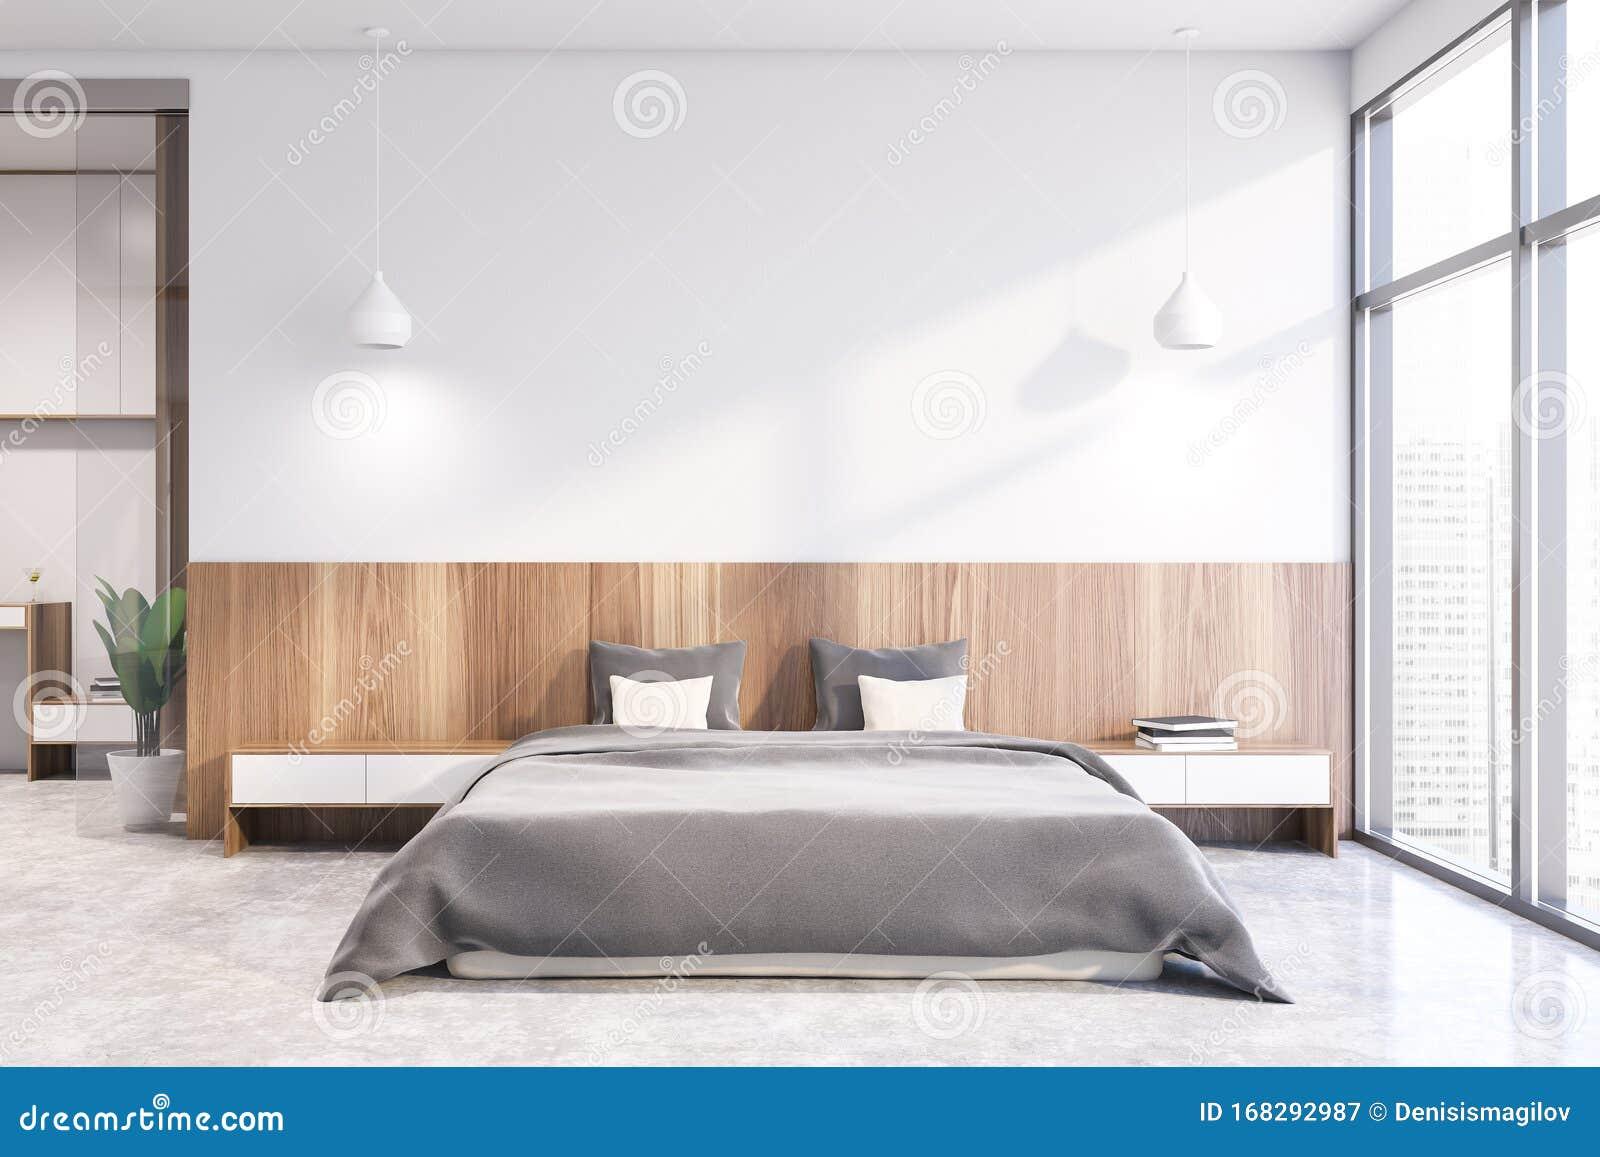 White Master Bedroom Interior Design Stock Illustration Illustration Of Loft Real 168292987